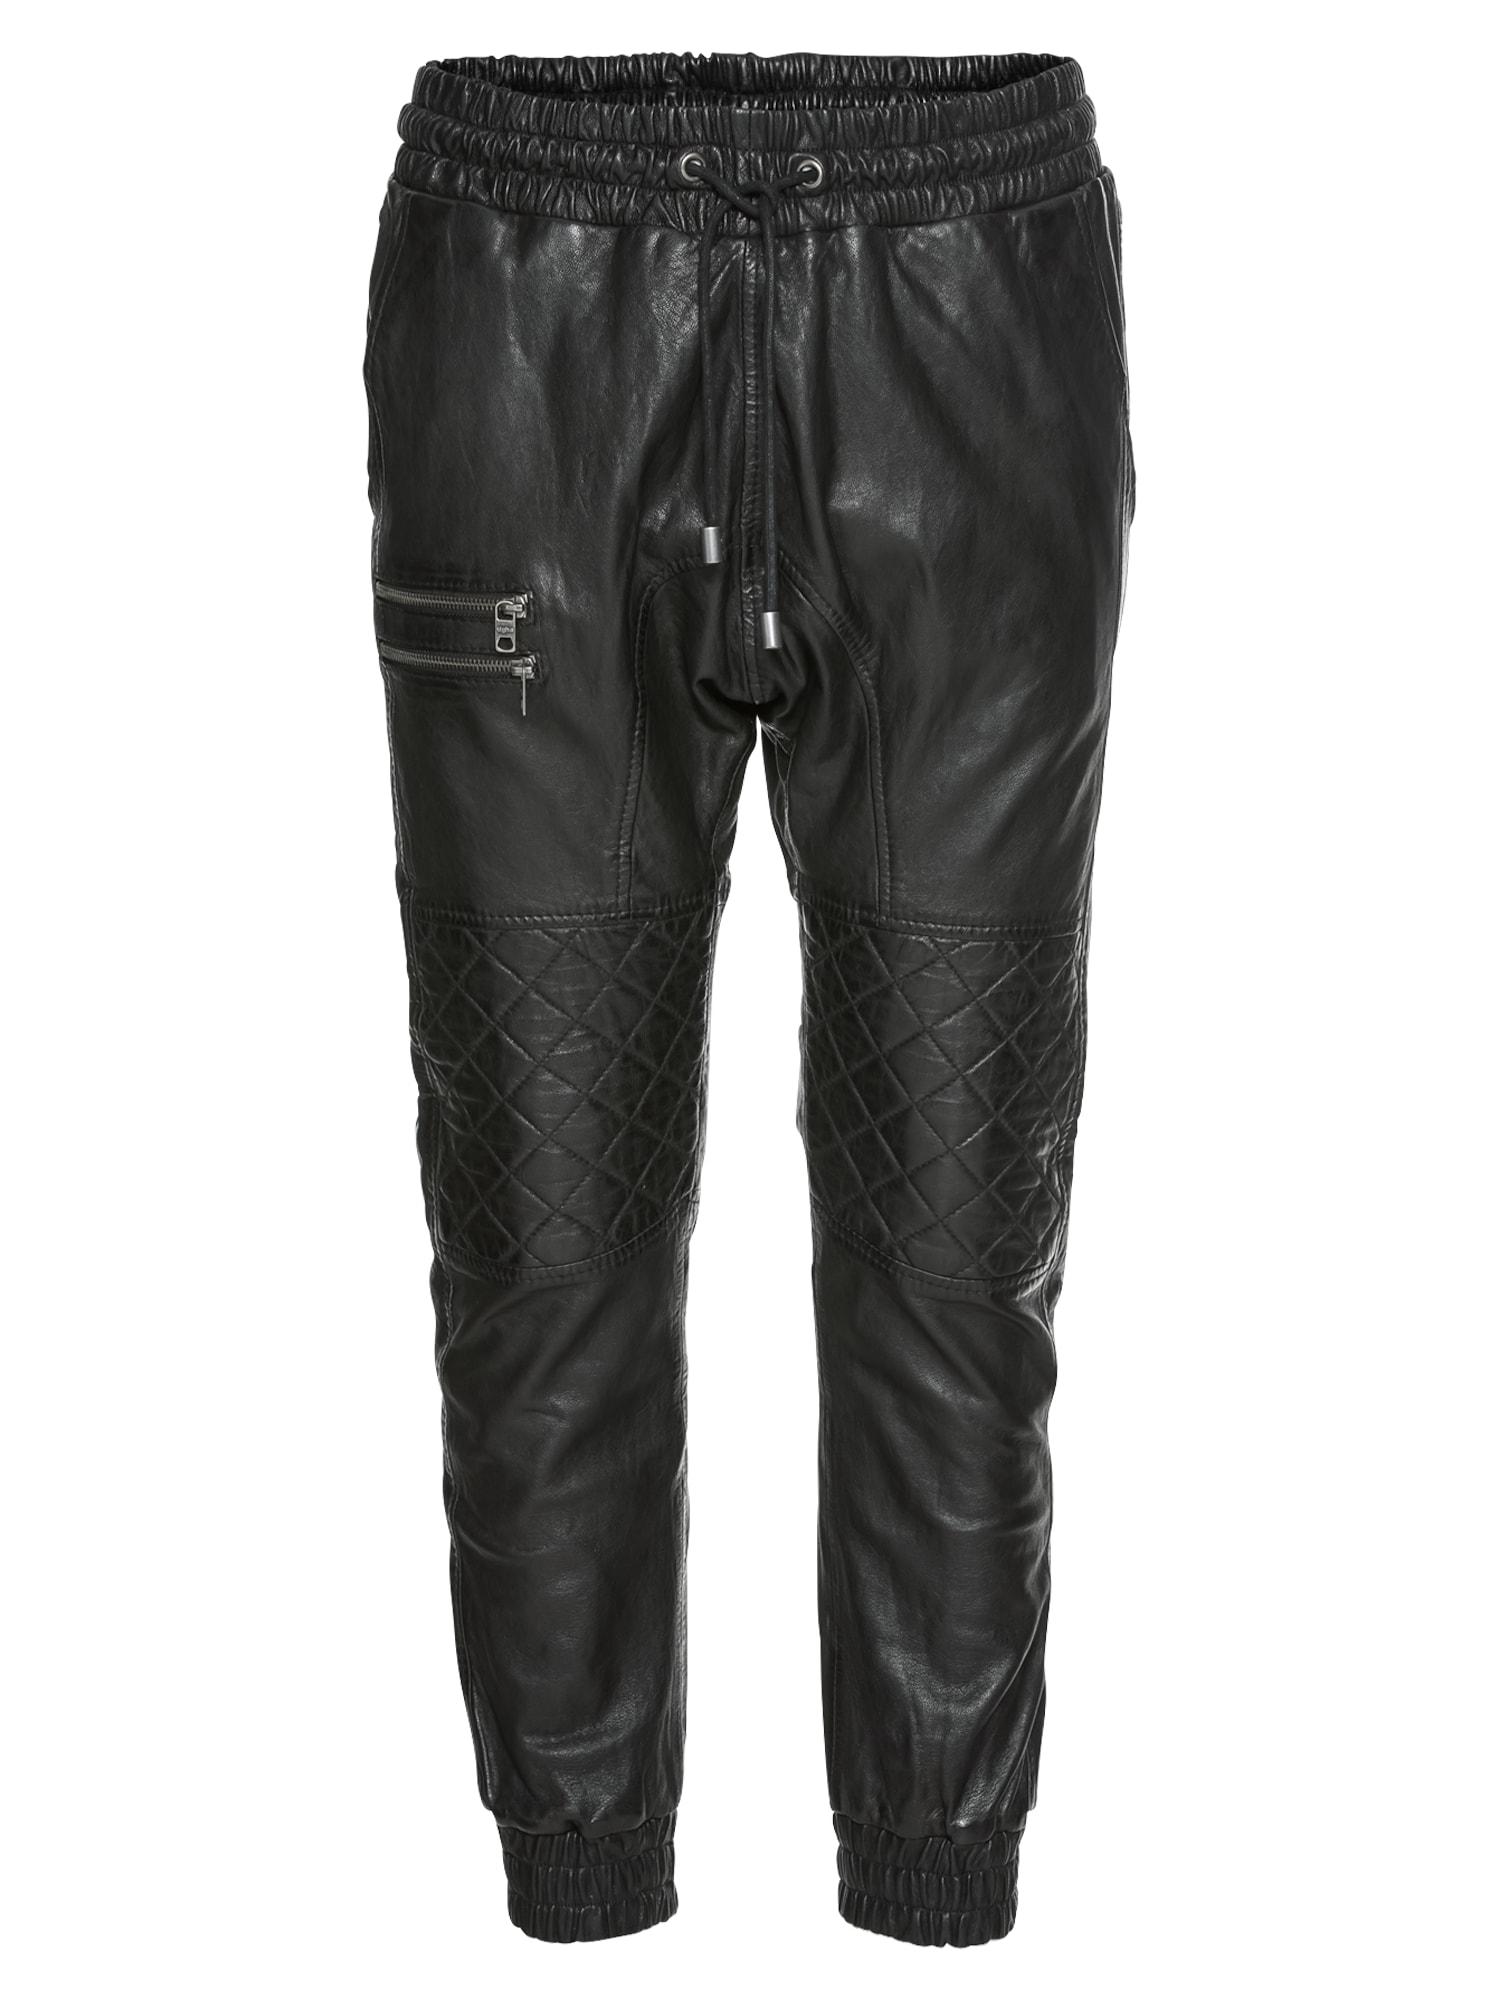 Kalhoty Marios černá Tigha